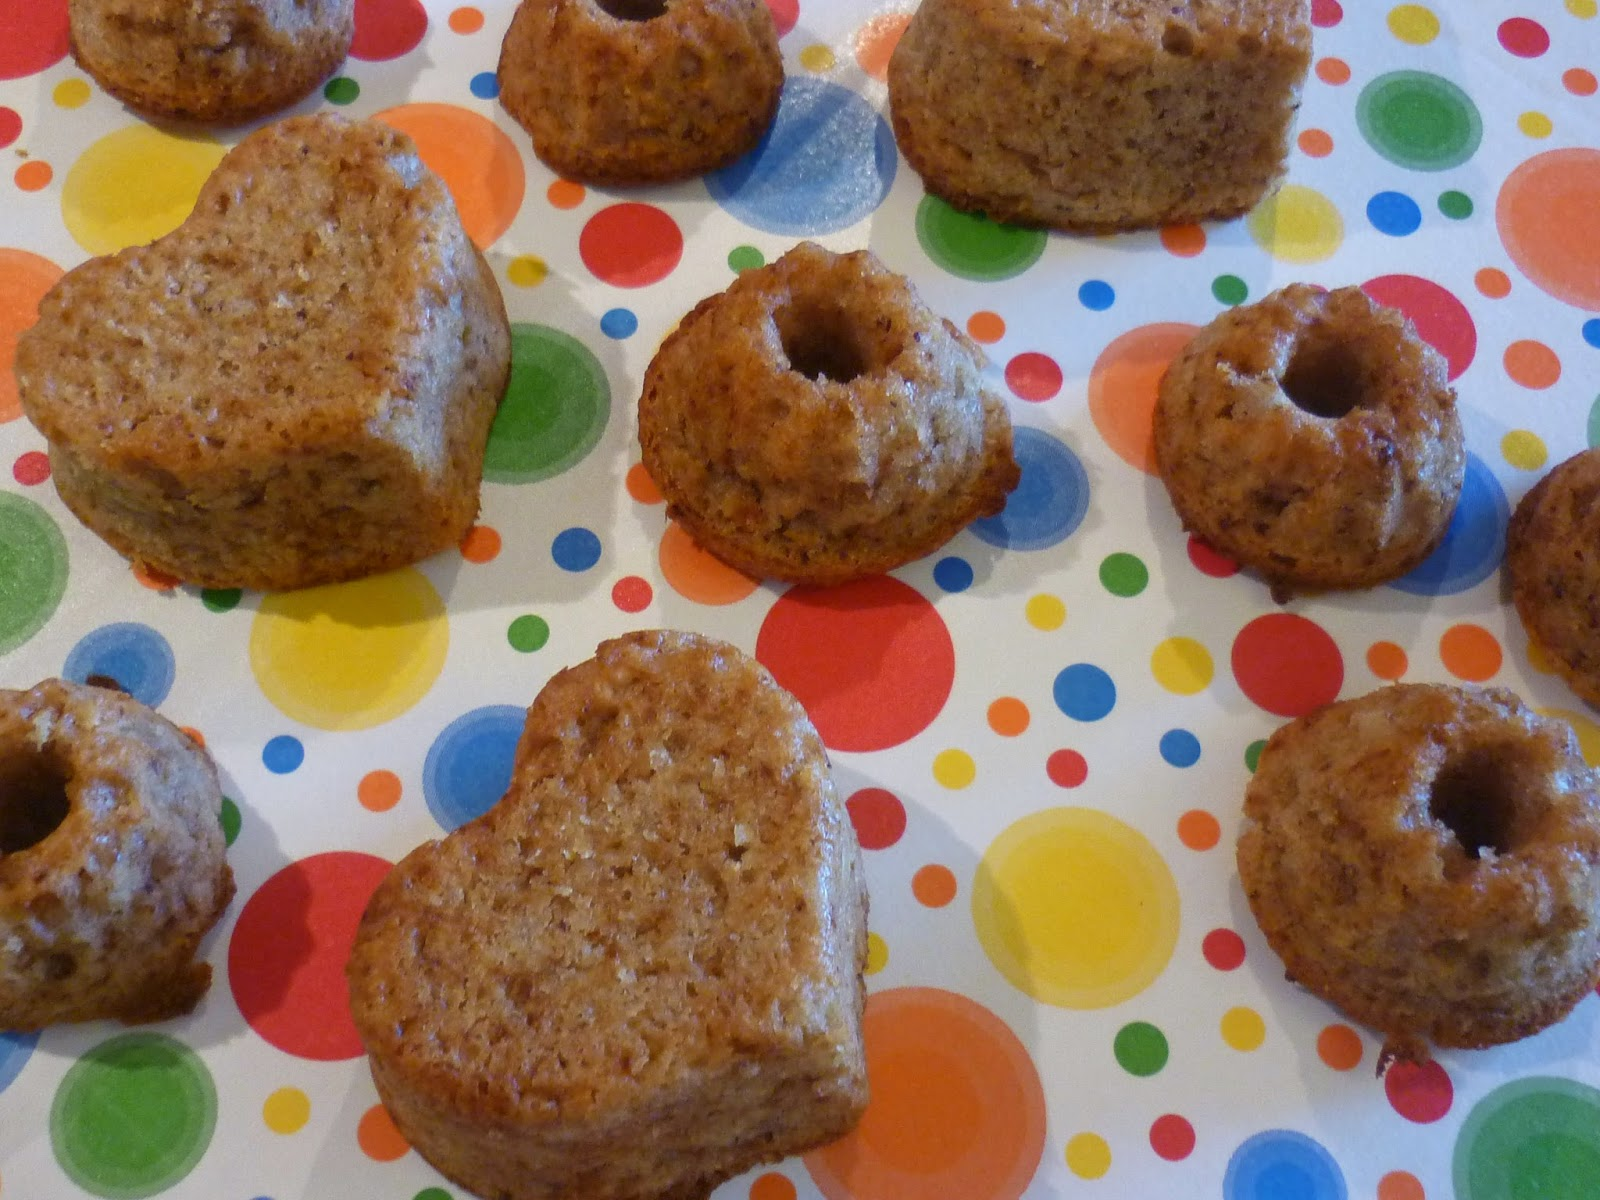 Sommerliche Mini Gugelhupf / Muffins